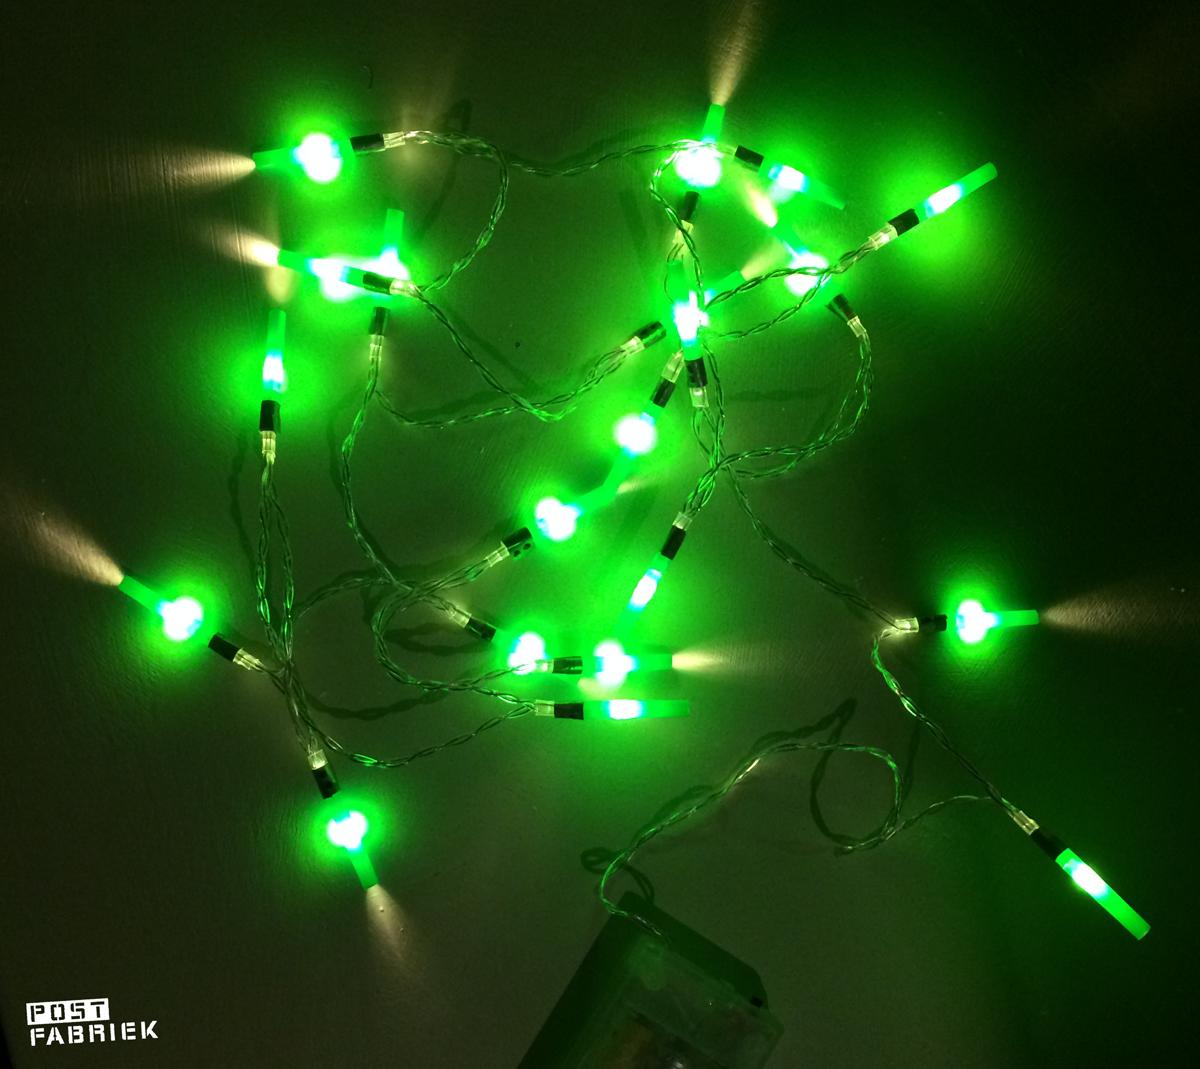 Lightsaber kerstlampjes